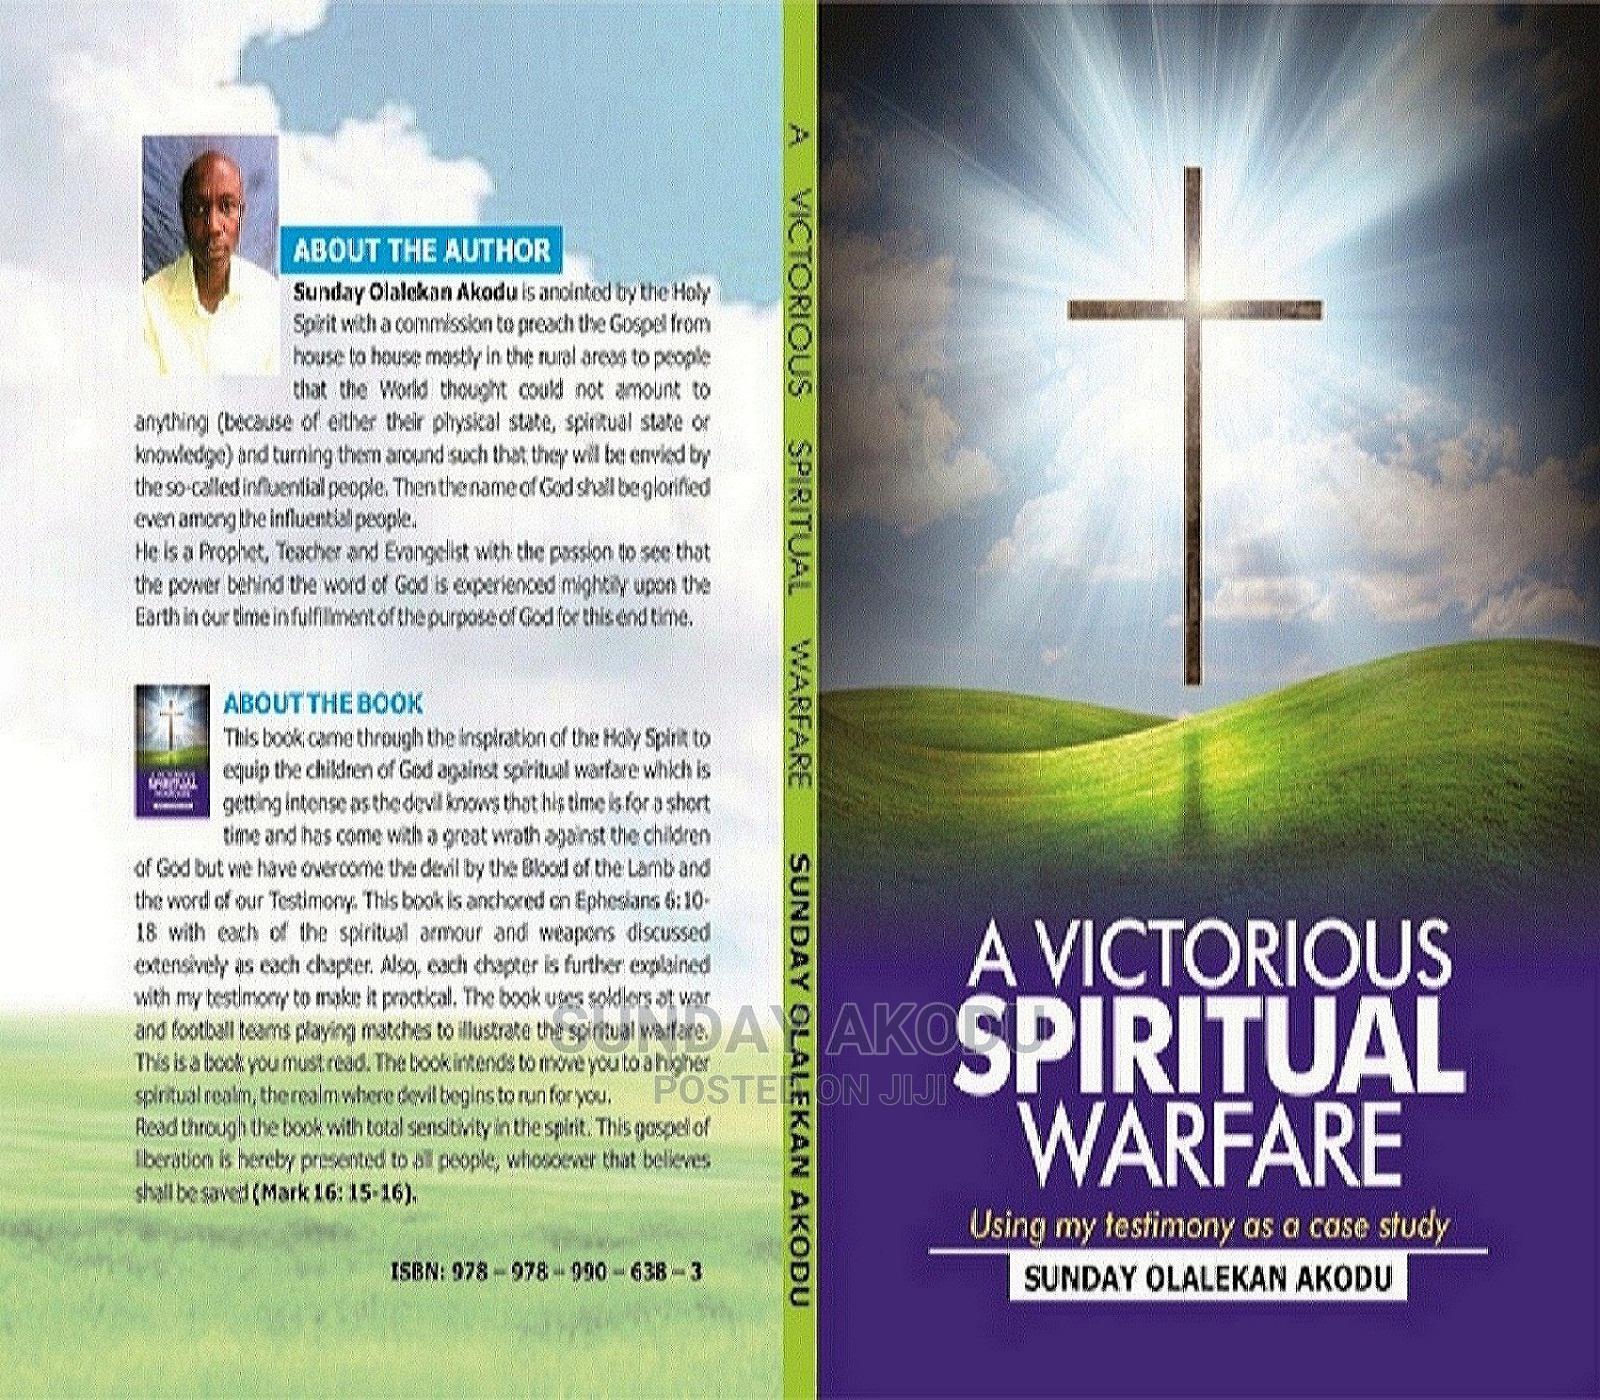 A Victorious Spiritual Warfare